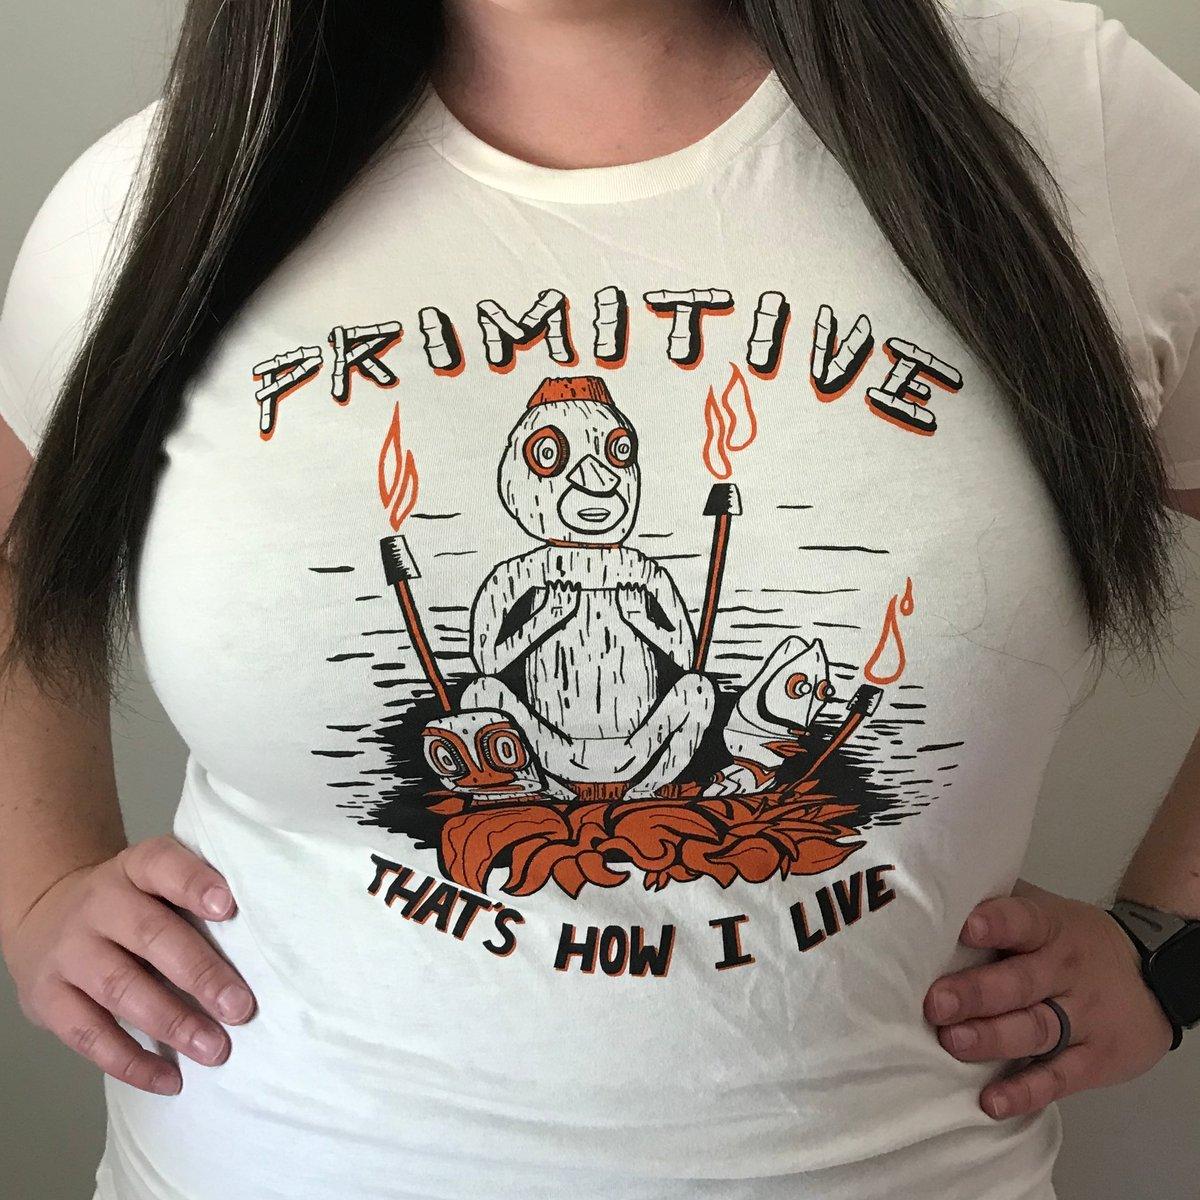 PRIMITIVE - THAT'S HOW I LIVE Tiki/Cramps mash-up Ladies Size T-Shirt